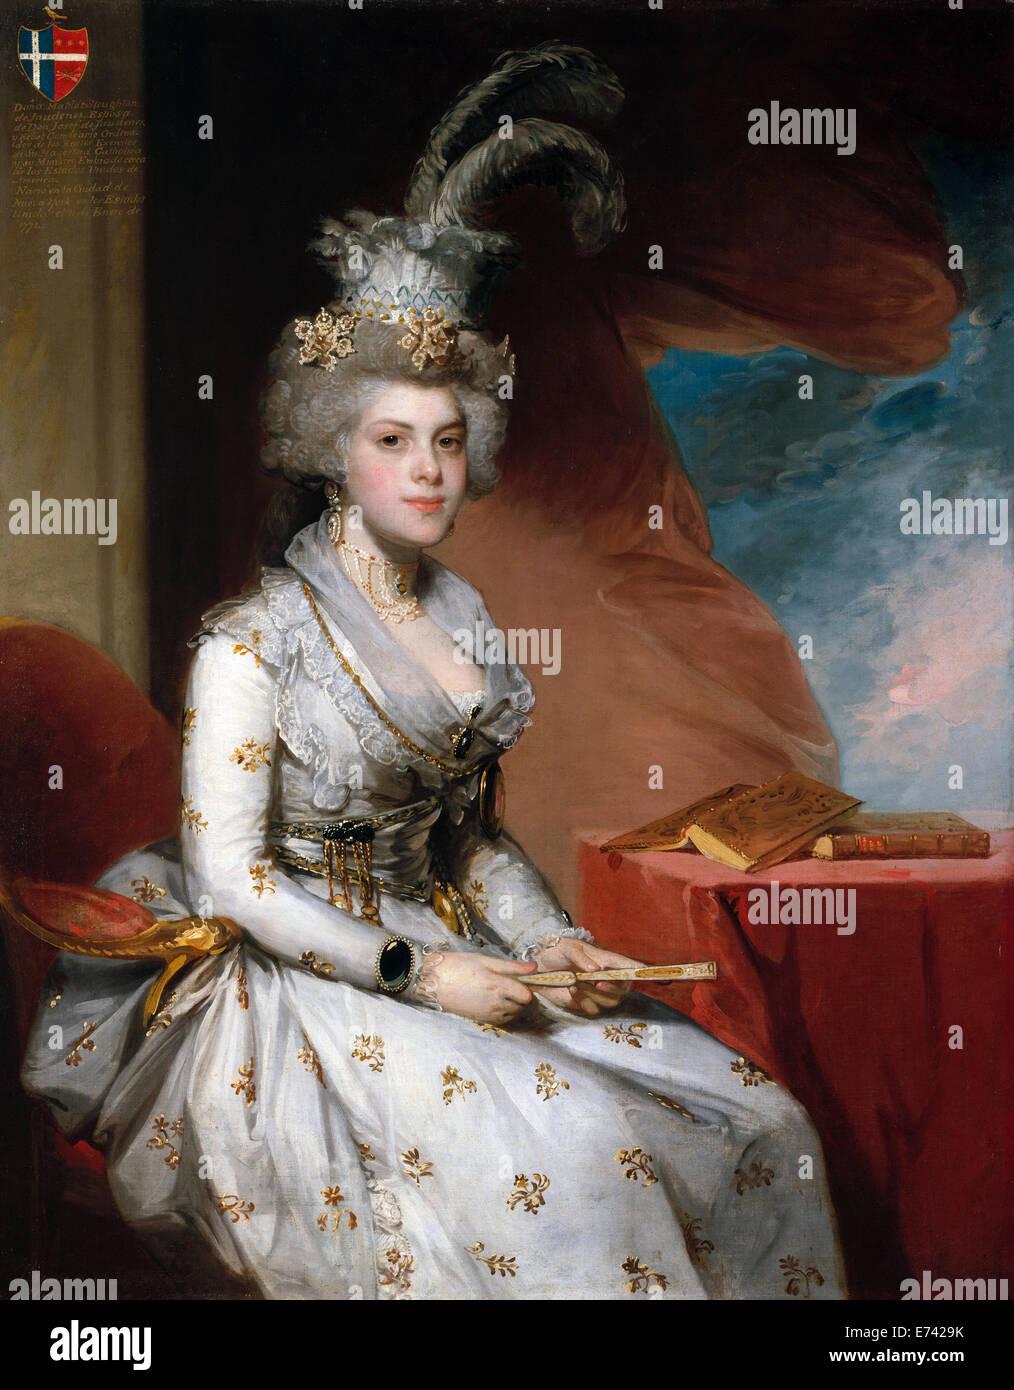 Matilda Stoughton de Jaudenes - by Gilbert Stuart, 1794 - Stock Image